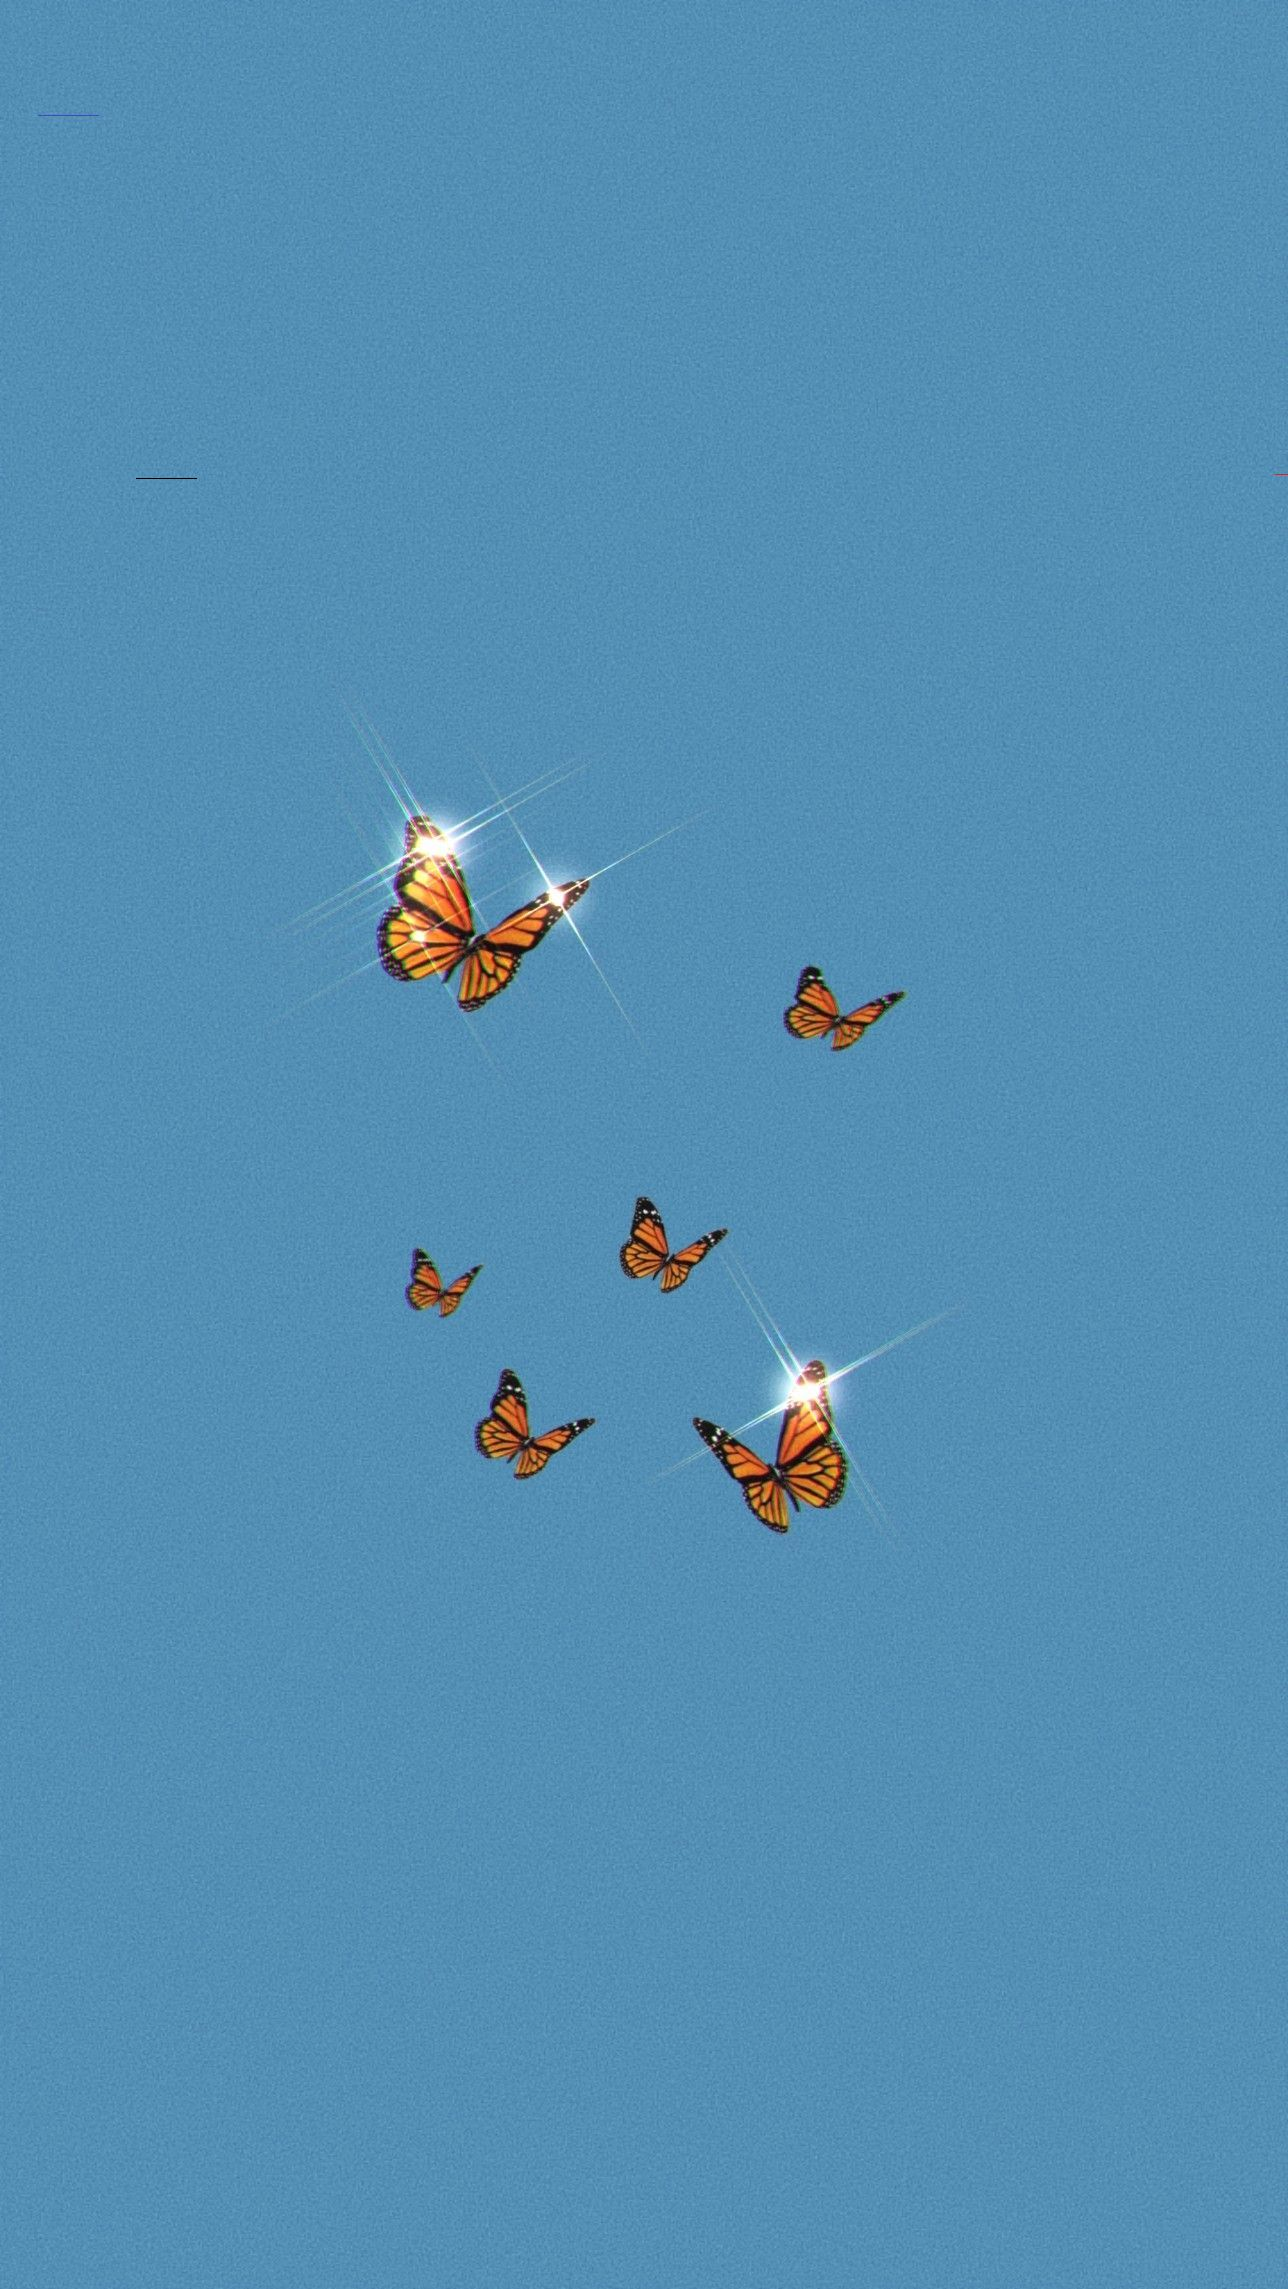 🖤 Aesthetic Butterfly Wallpaper Live - 2021